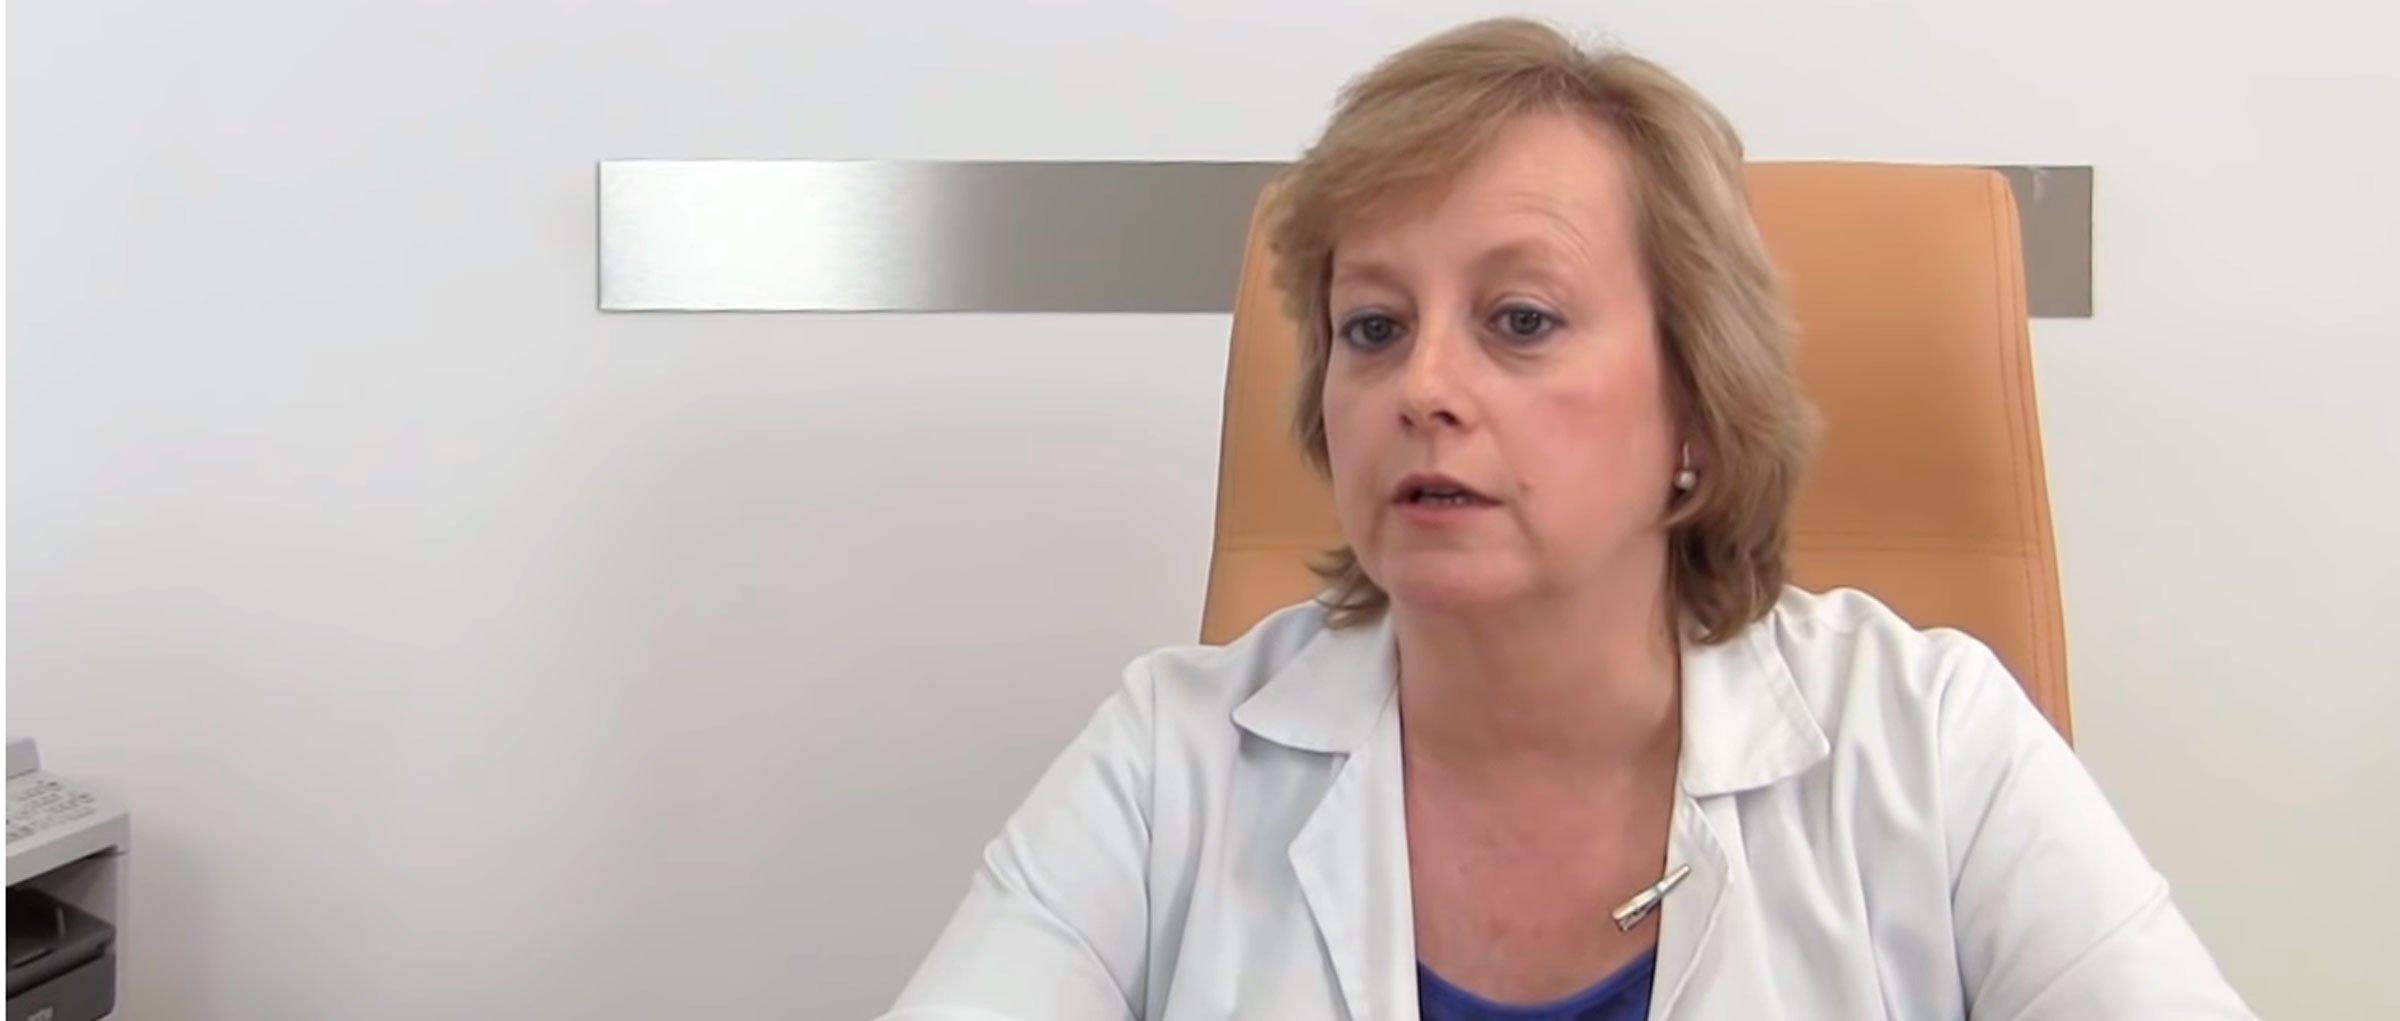 Dr Elena Martín sur l'hydrosalpinx